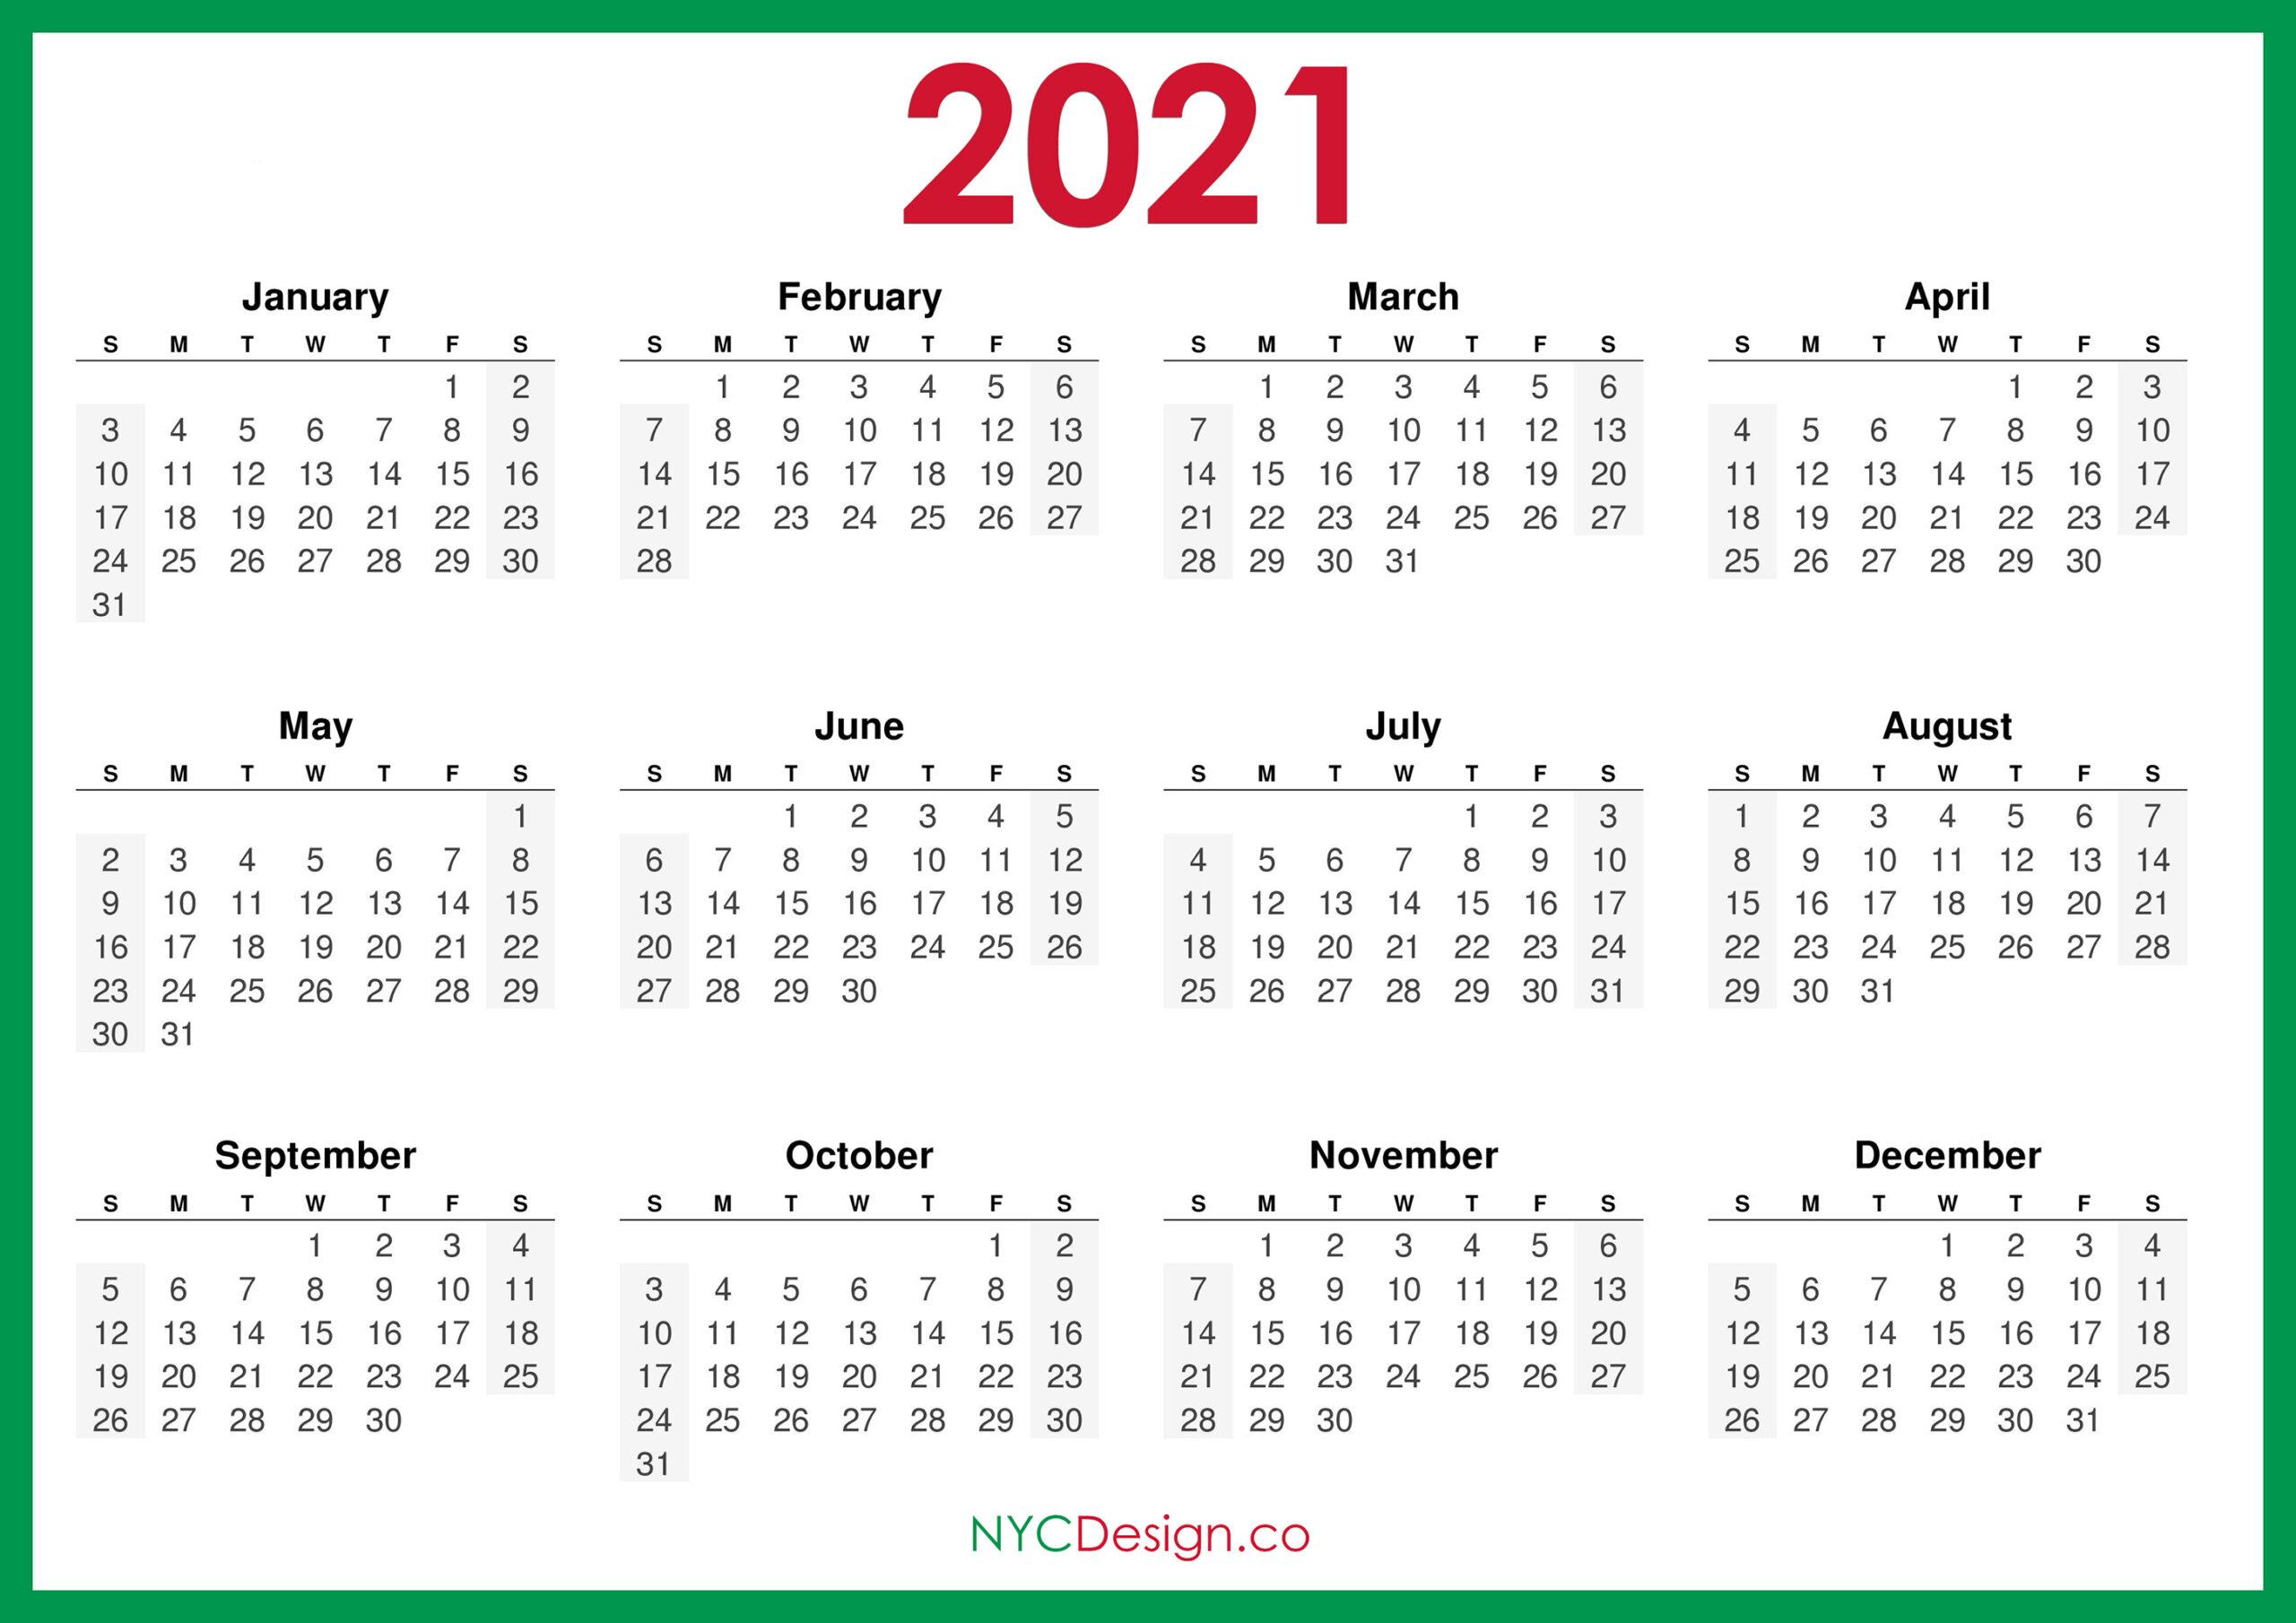 2021 Calendar Printable Free, Horizontal, Green, Hd